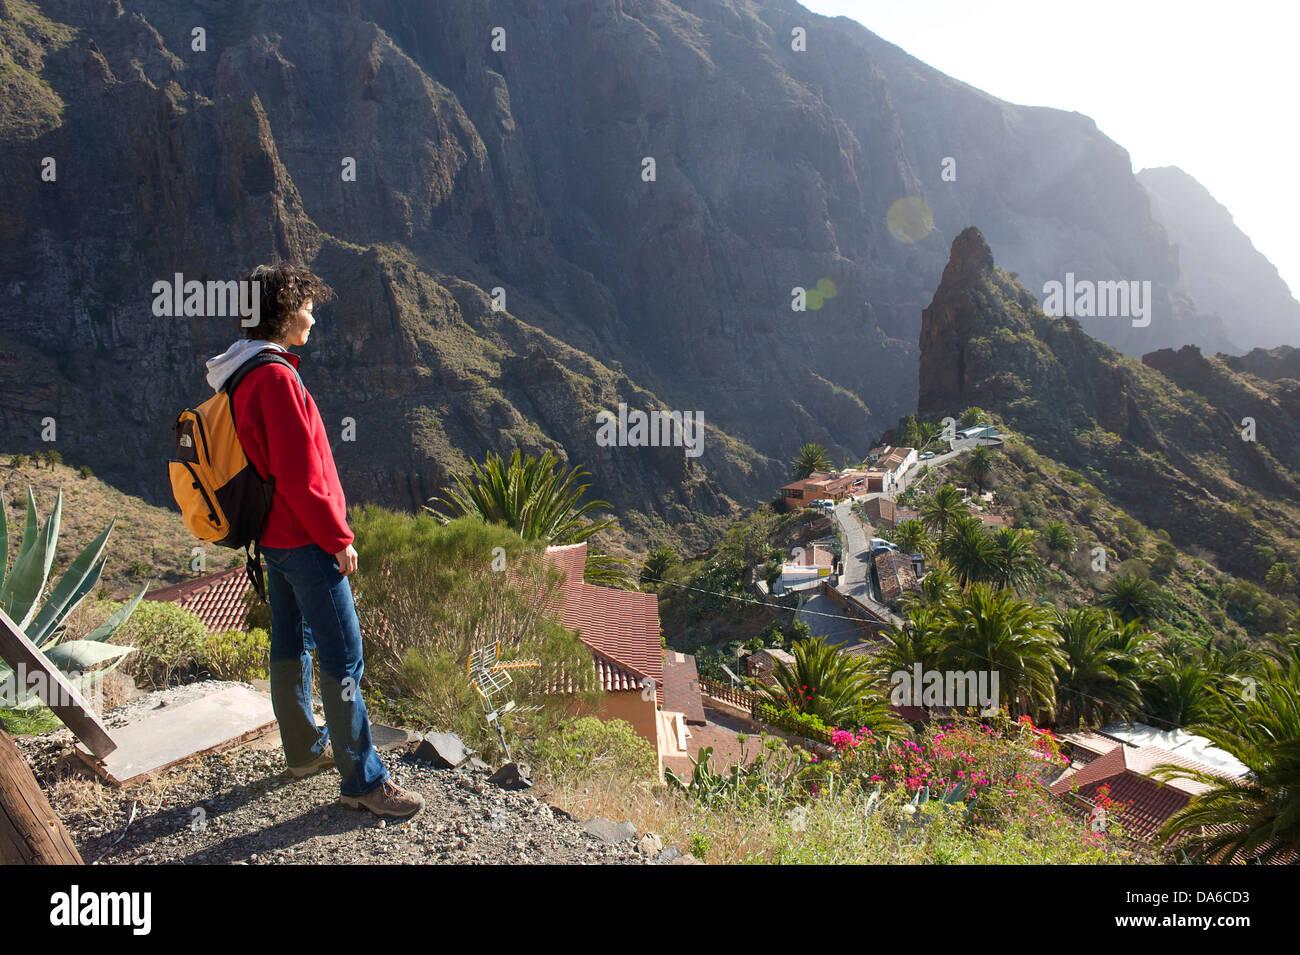 Tenerife, Teneriffa, Canaries, Canary islands, isles, Spain, Spanish, Europe, Masca, mountain landscape, mountain - Stock Image